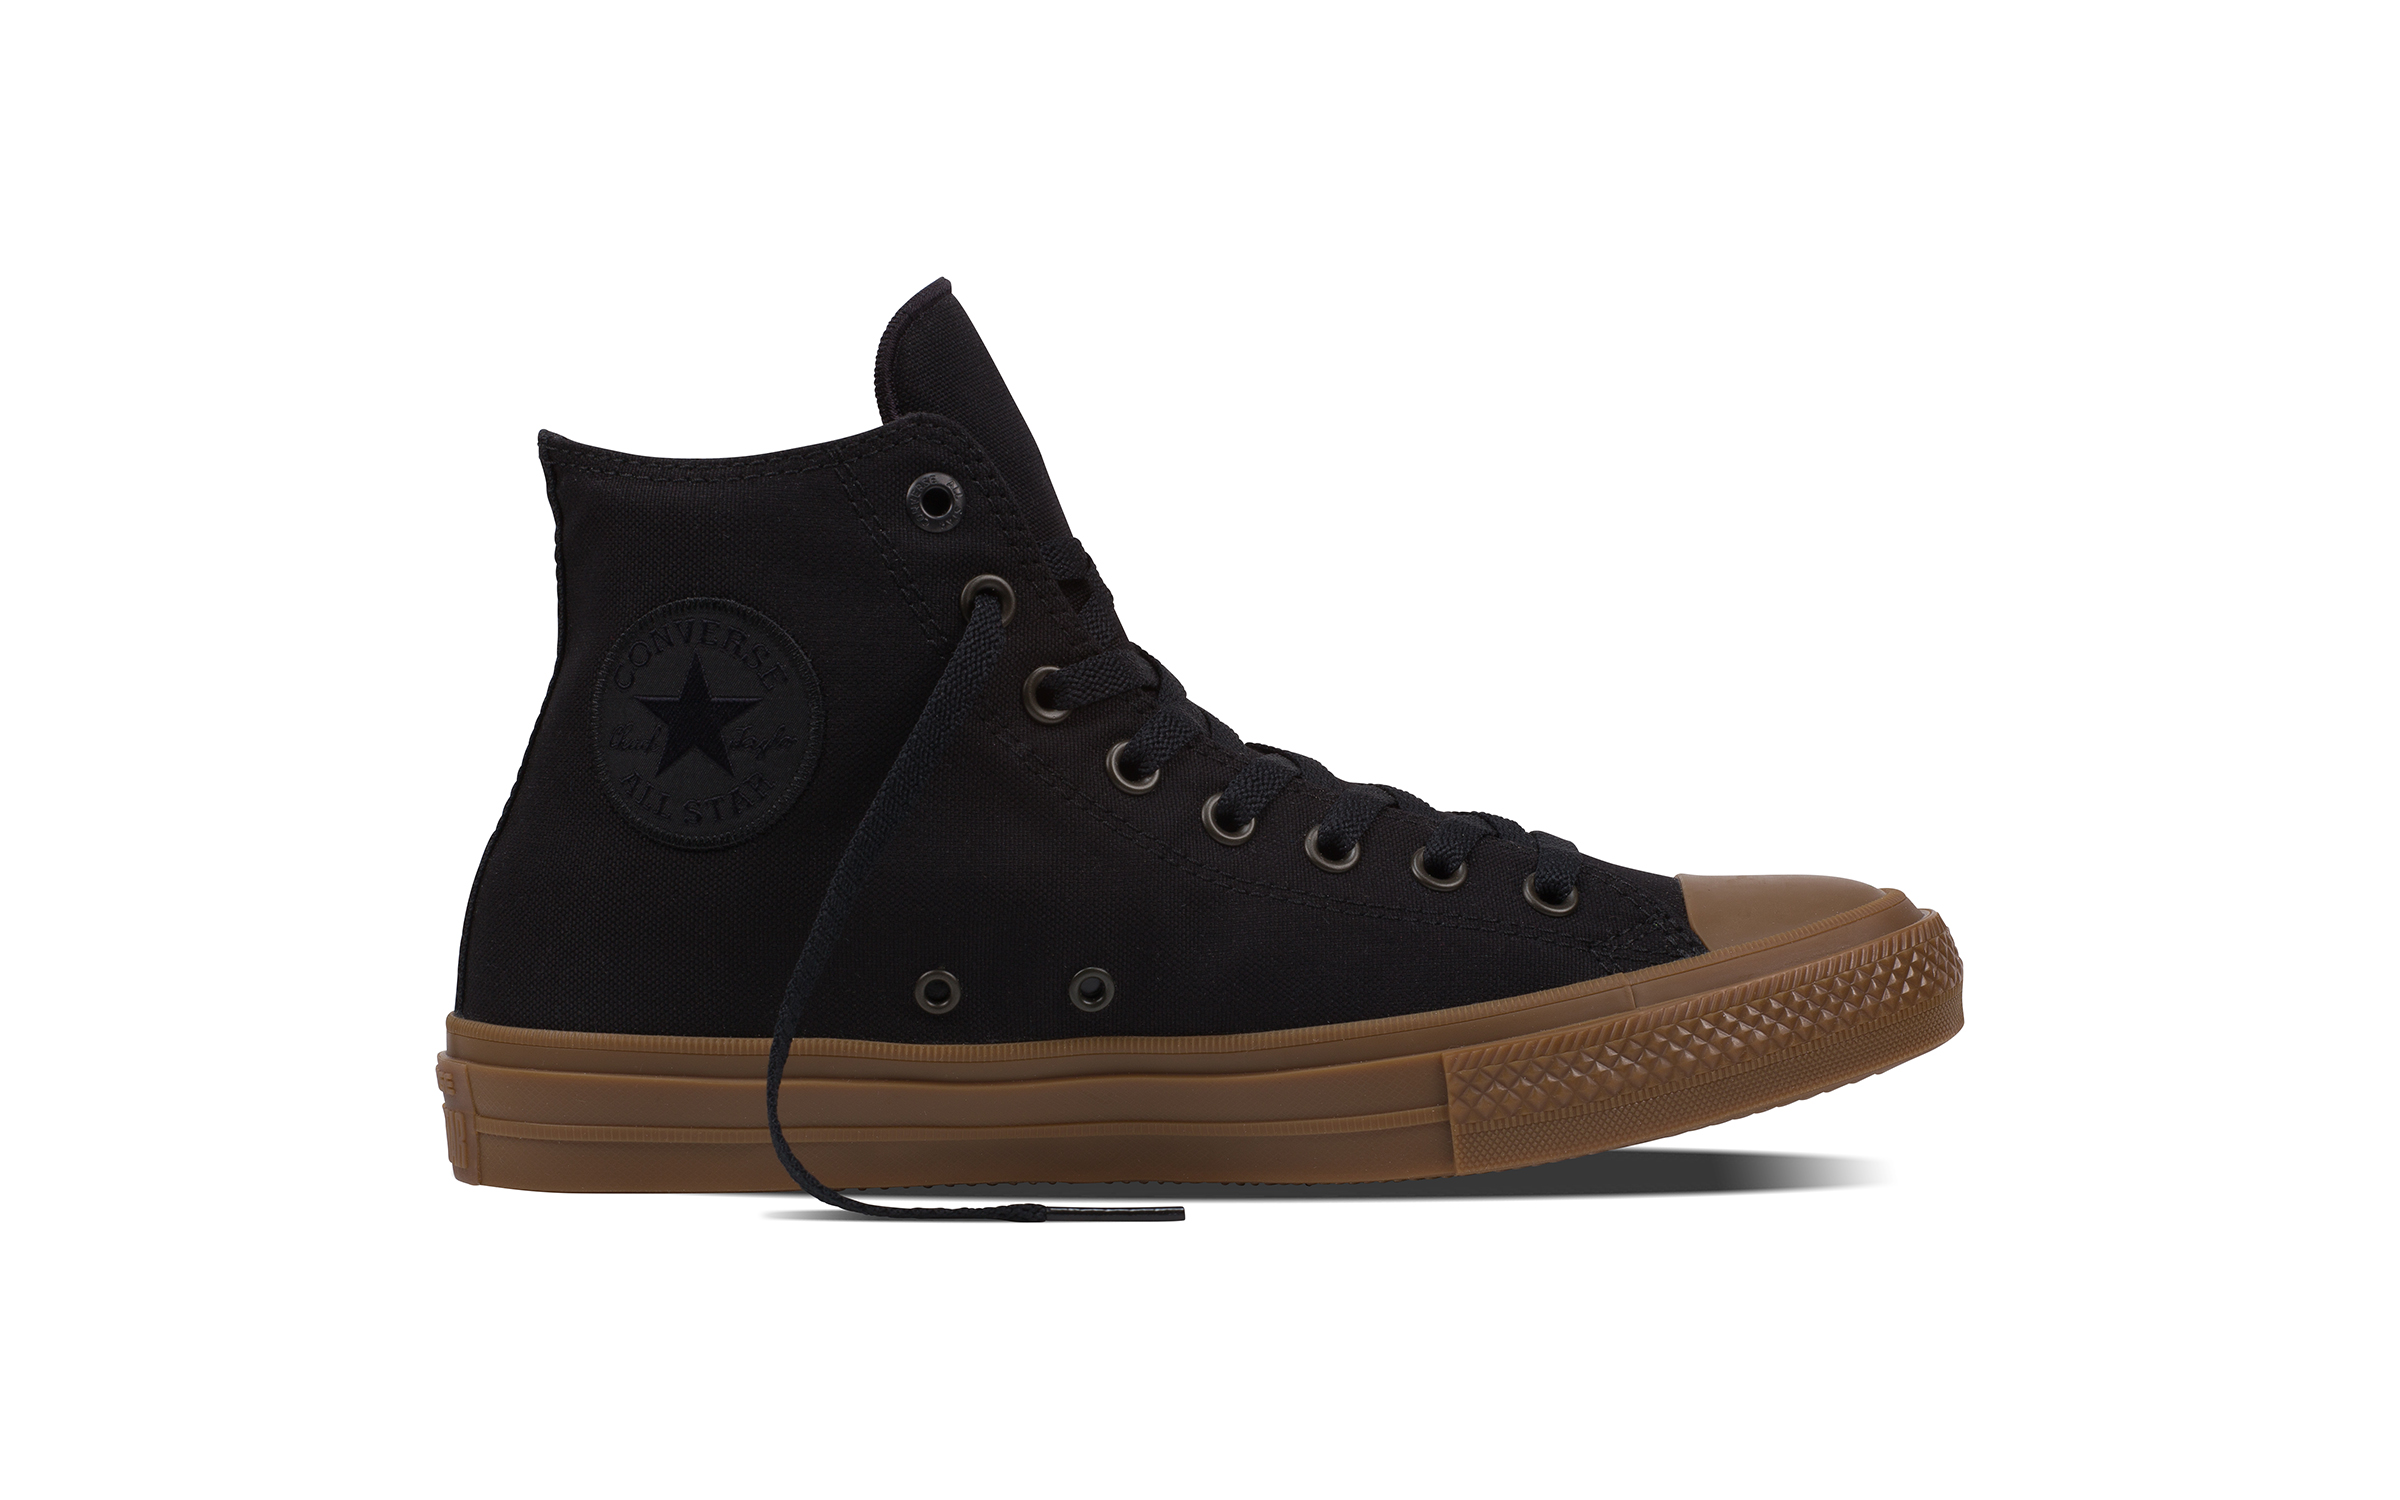 Converse Drops Chuck Taylor All Star II